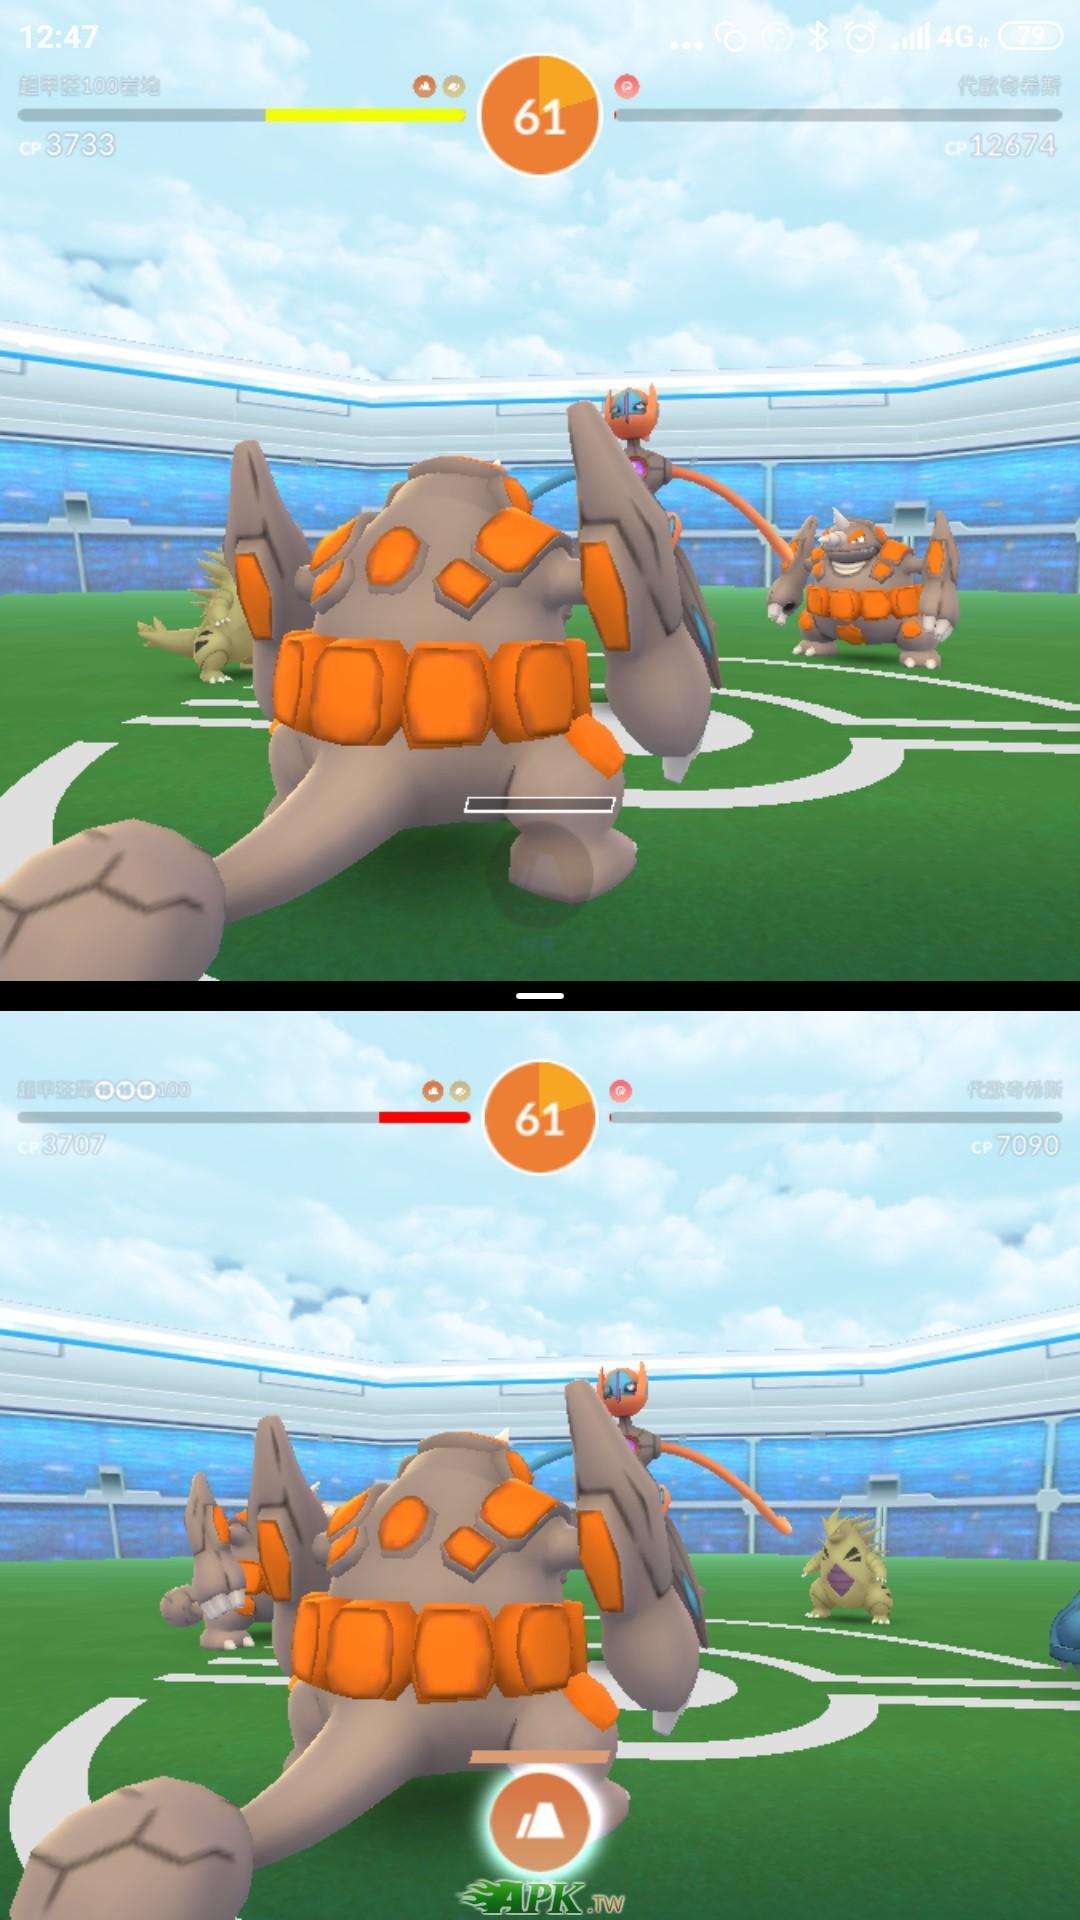 Screenshot_2019-07-02-12-47-17-863_com.nianticlabs.pokemongo.jpg